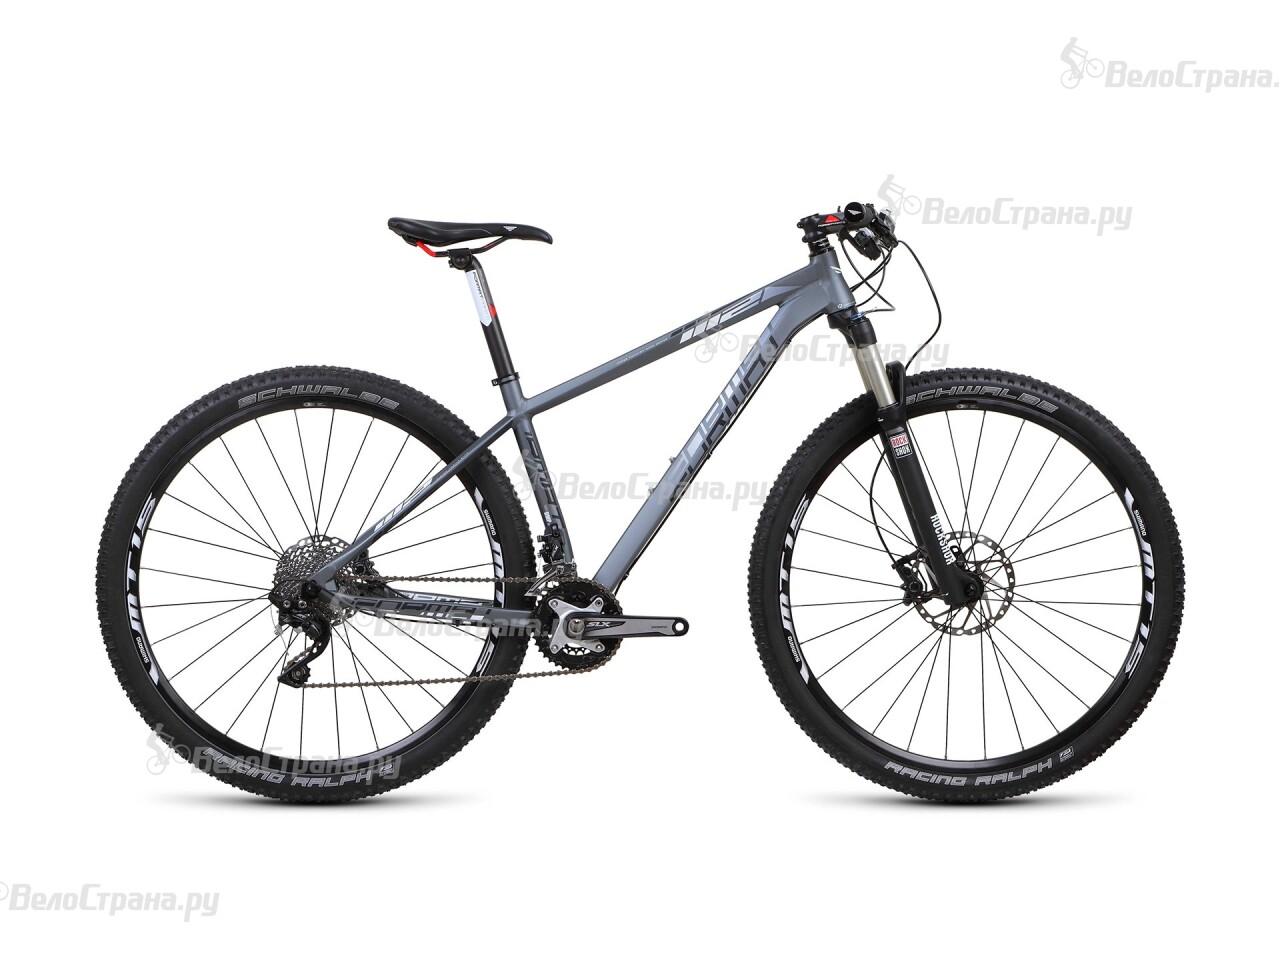 цена на Велосипед Format 1112 Elite 29 (2016)